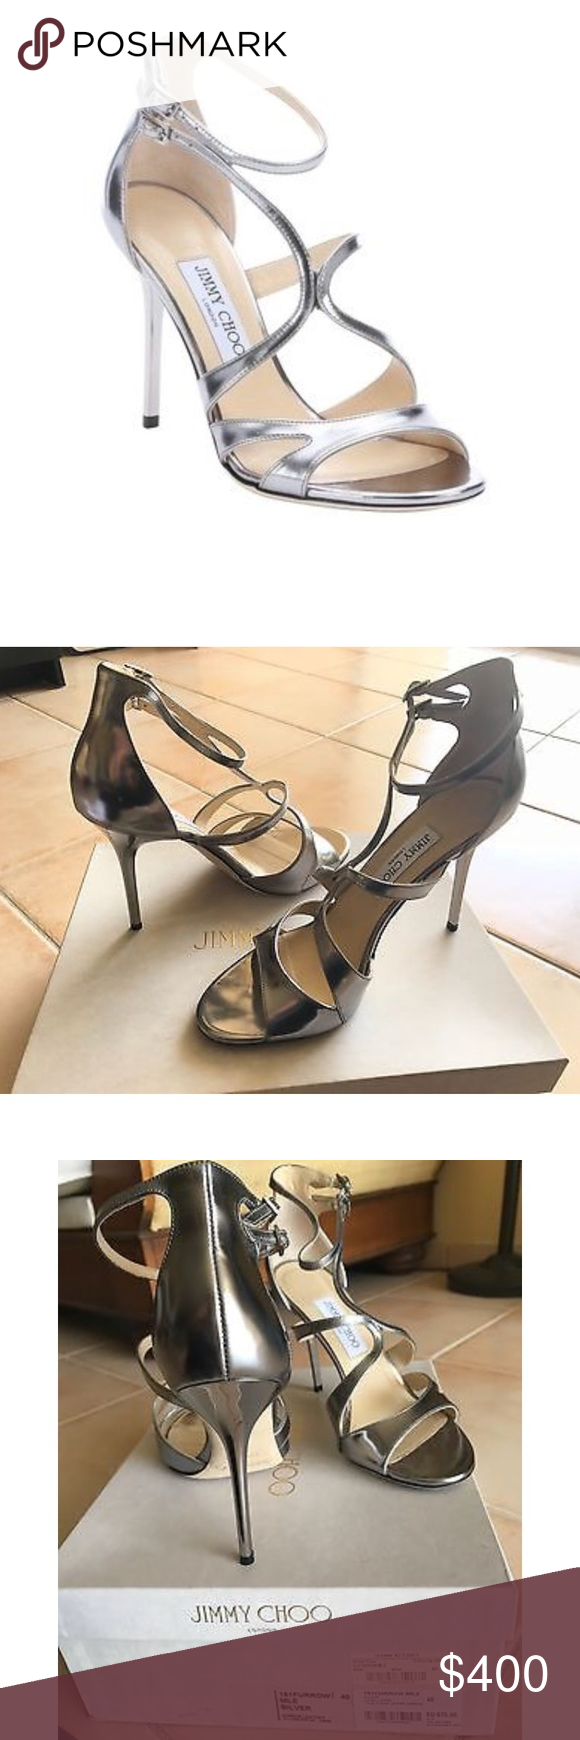 b02894d4188 Jimmy Choo Furrow Metallic Leather Sandals Authentic Jimmy Choo 151 Furrow  Silver Sandals. Worn once